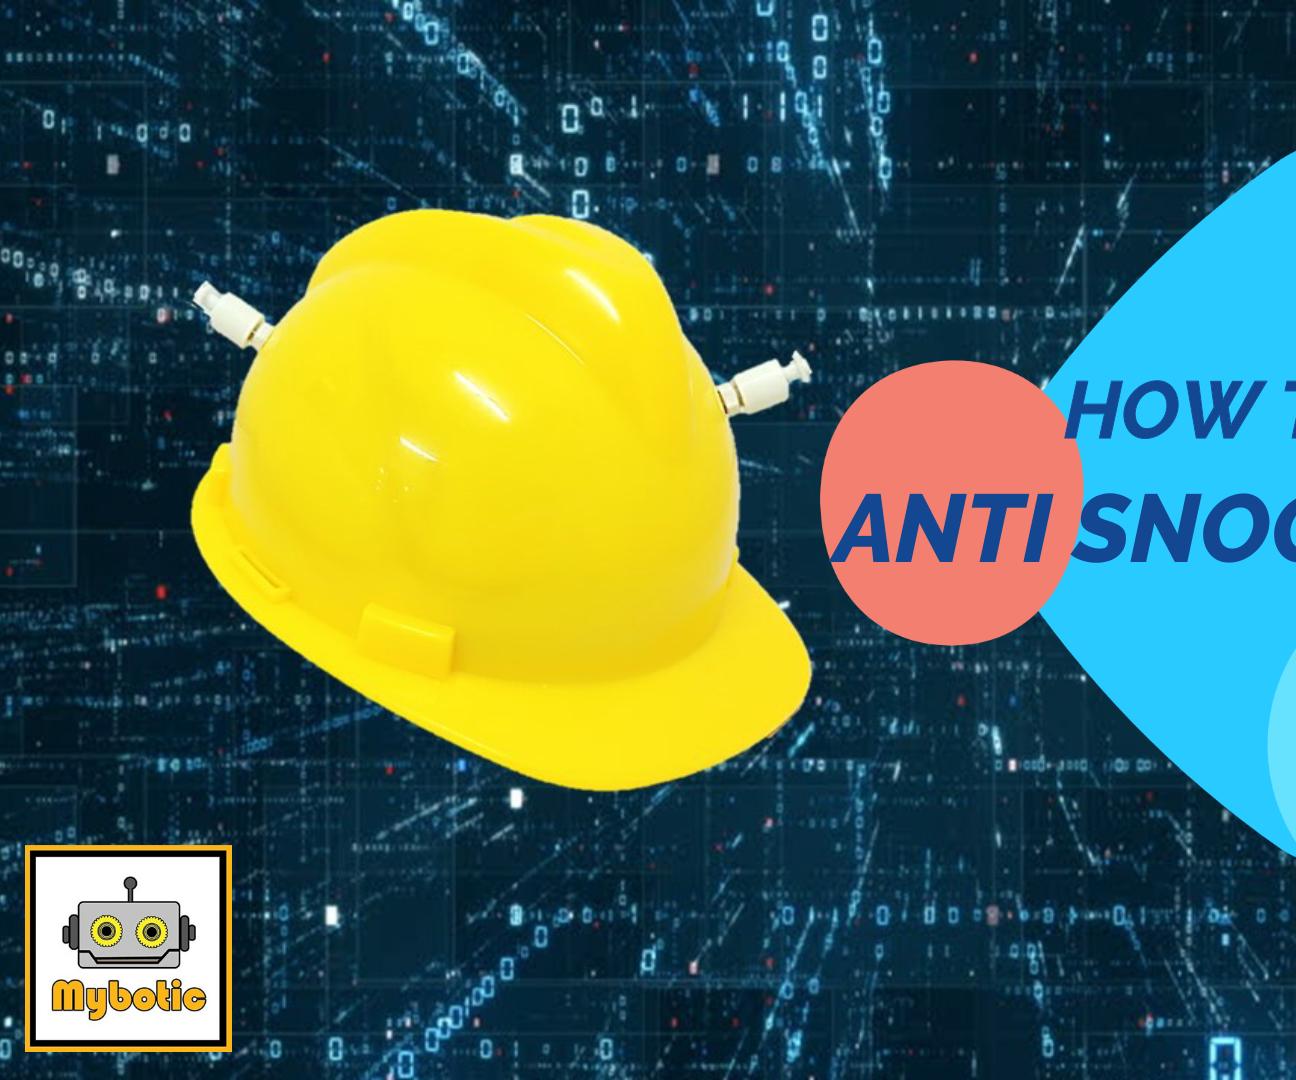 How to Make Anti Snooze Helmet